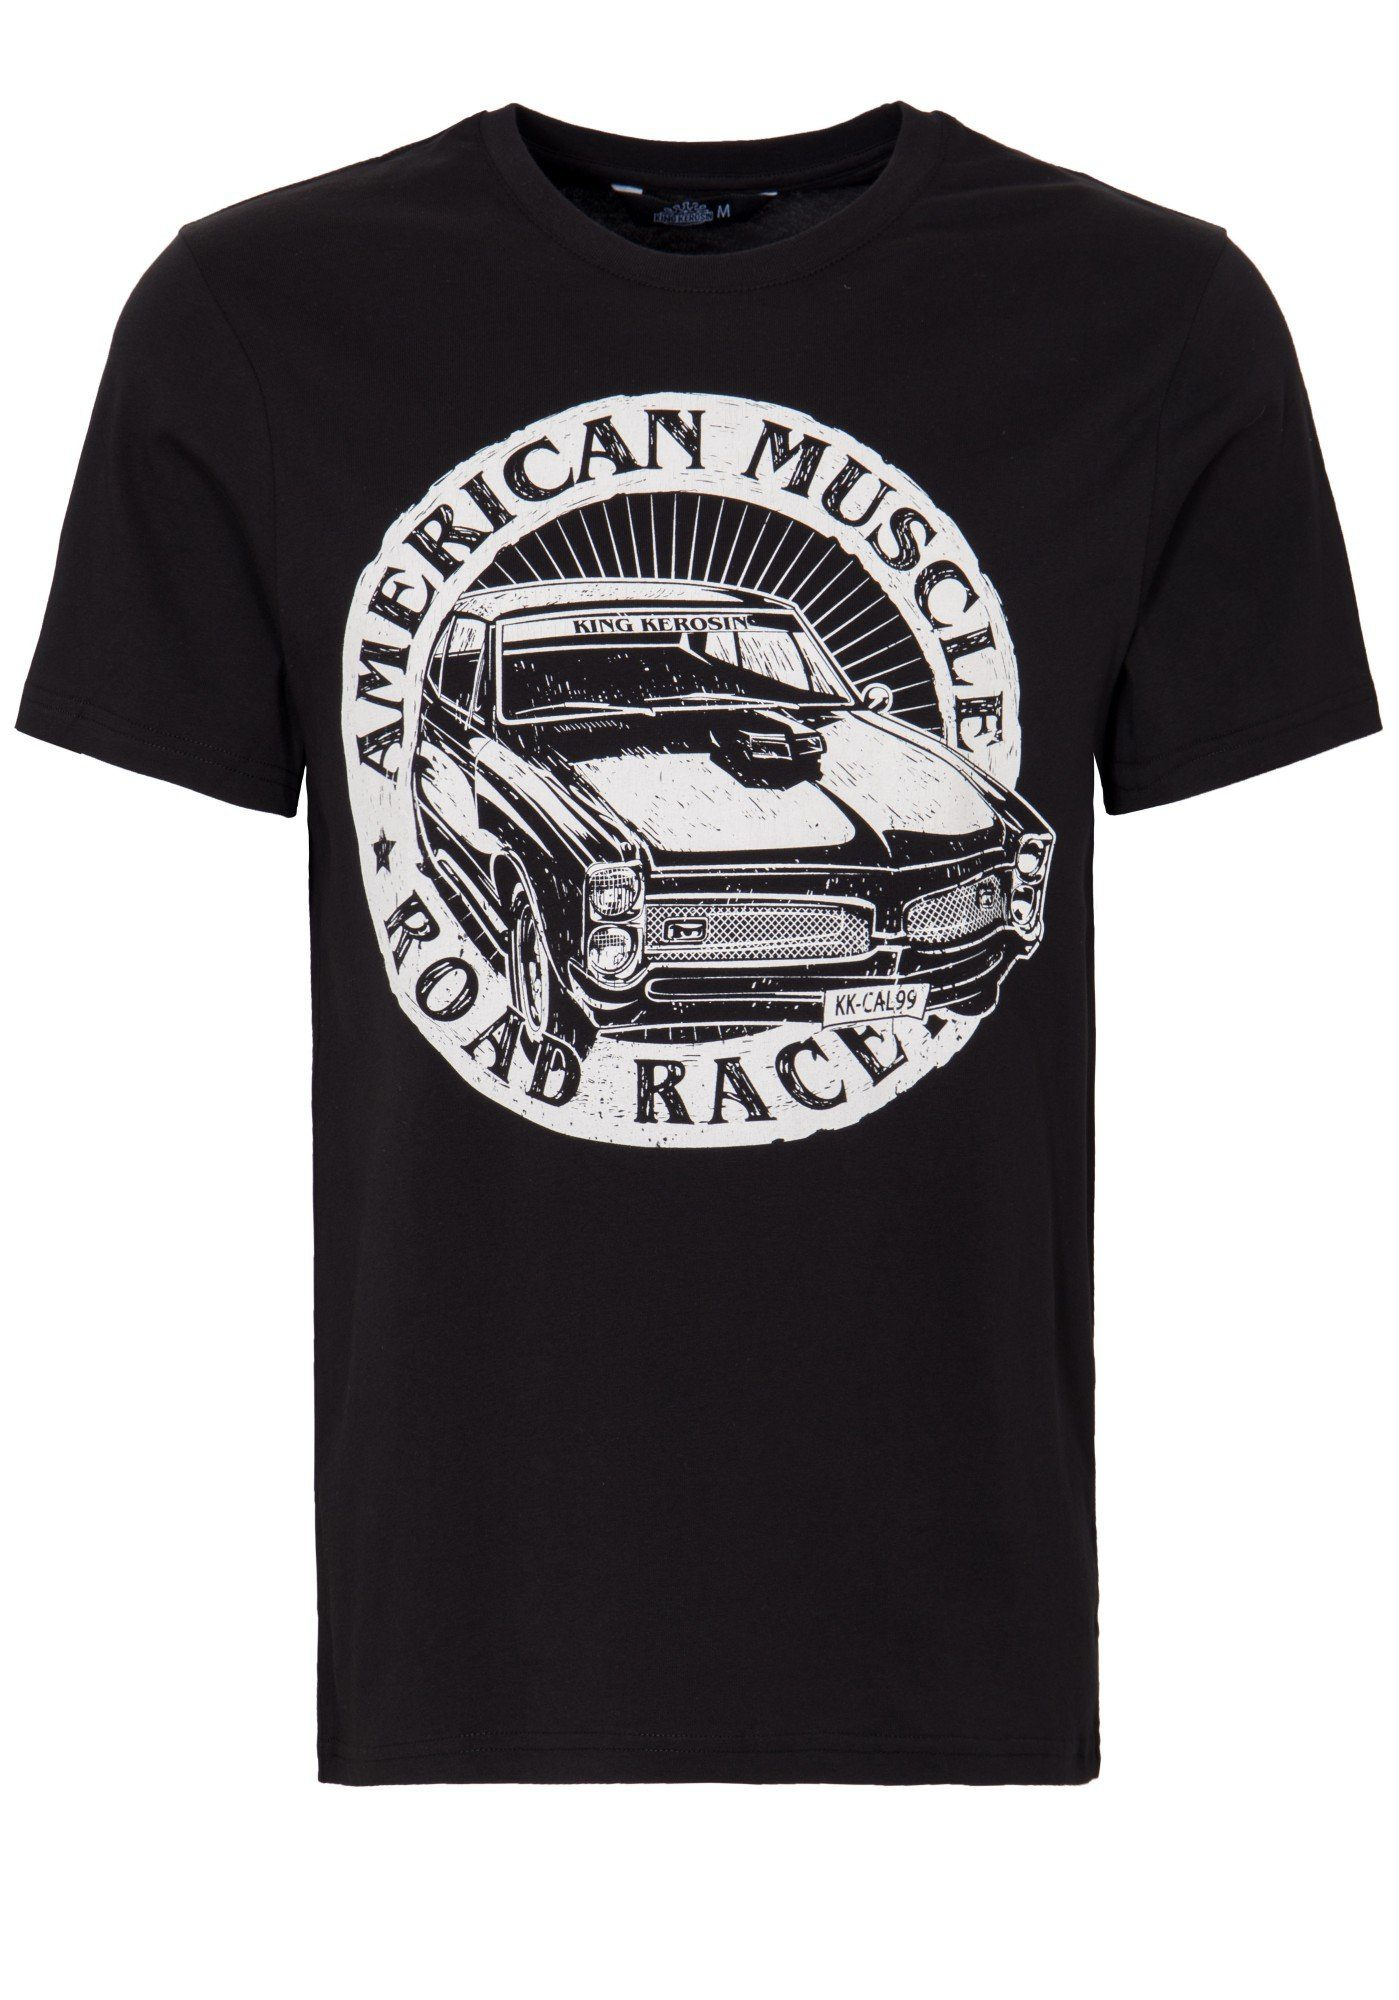 KingKerosin T-Shirt »American Muscle« | Bekleidung > Shirts > Sonstige Shirts | Schwarz | Jersey - Jeans | KINGKEROSIN